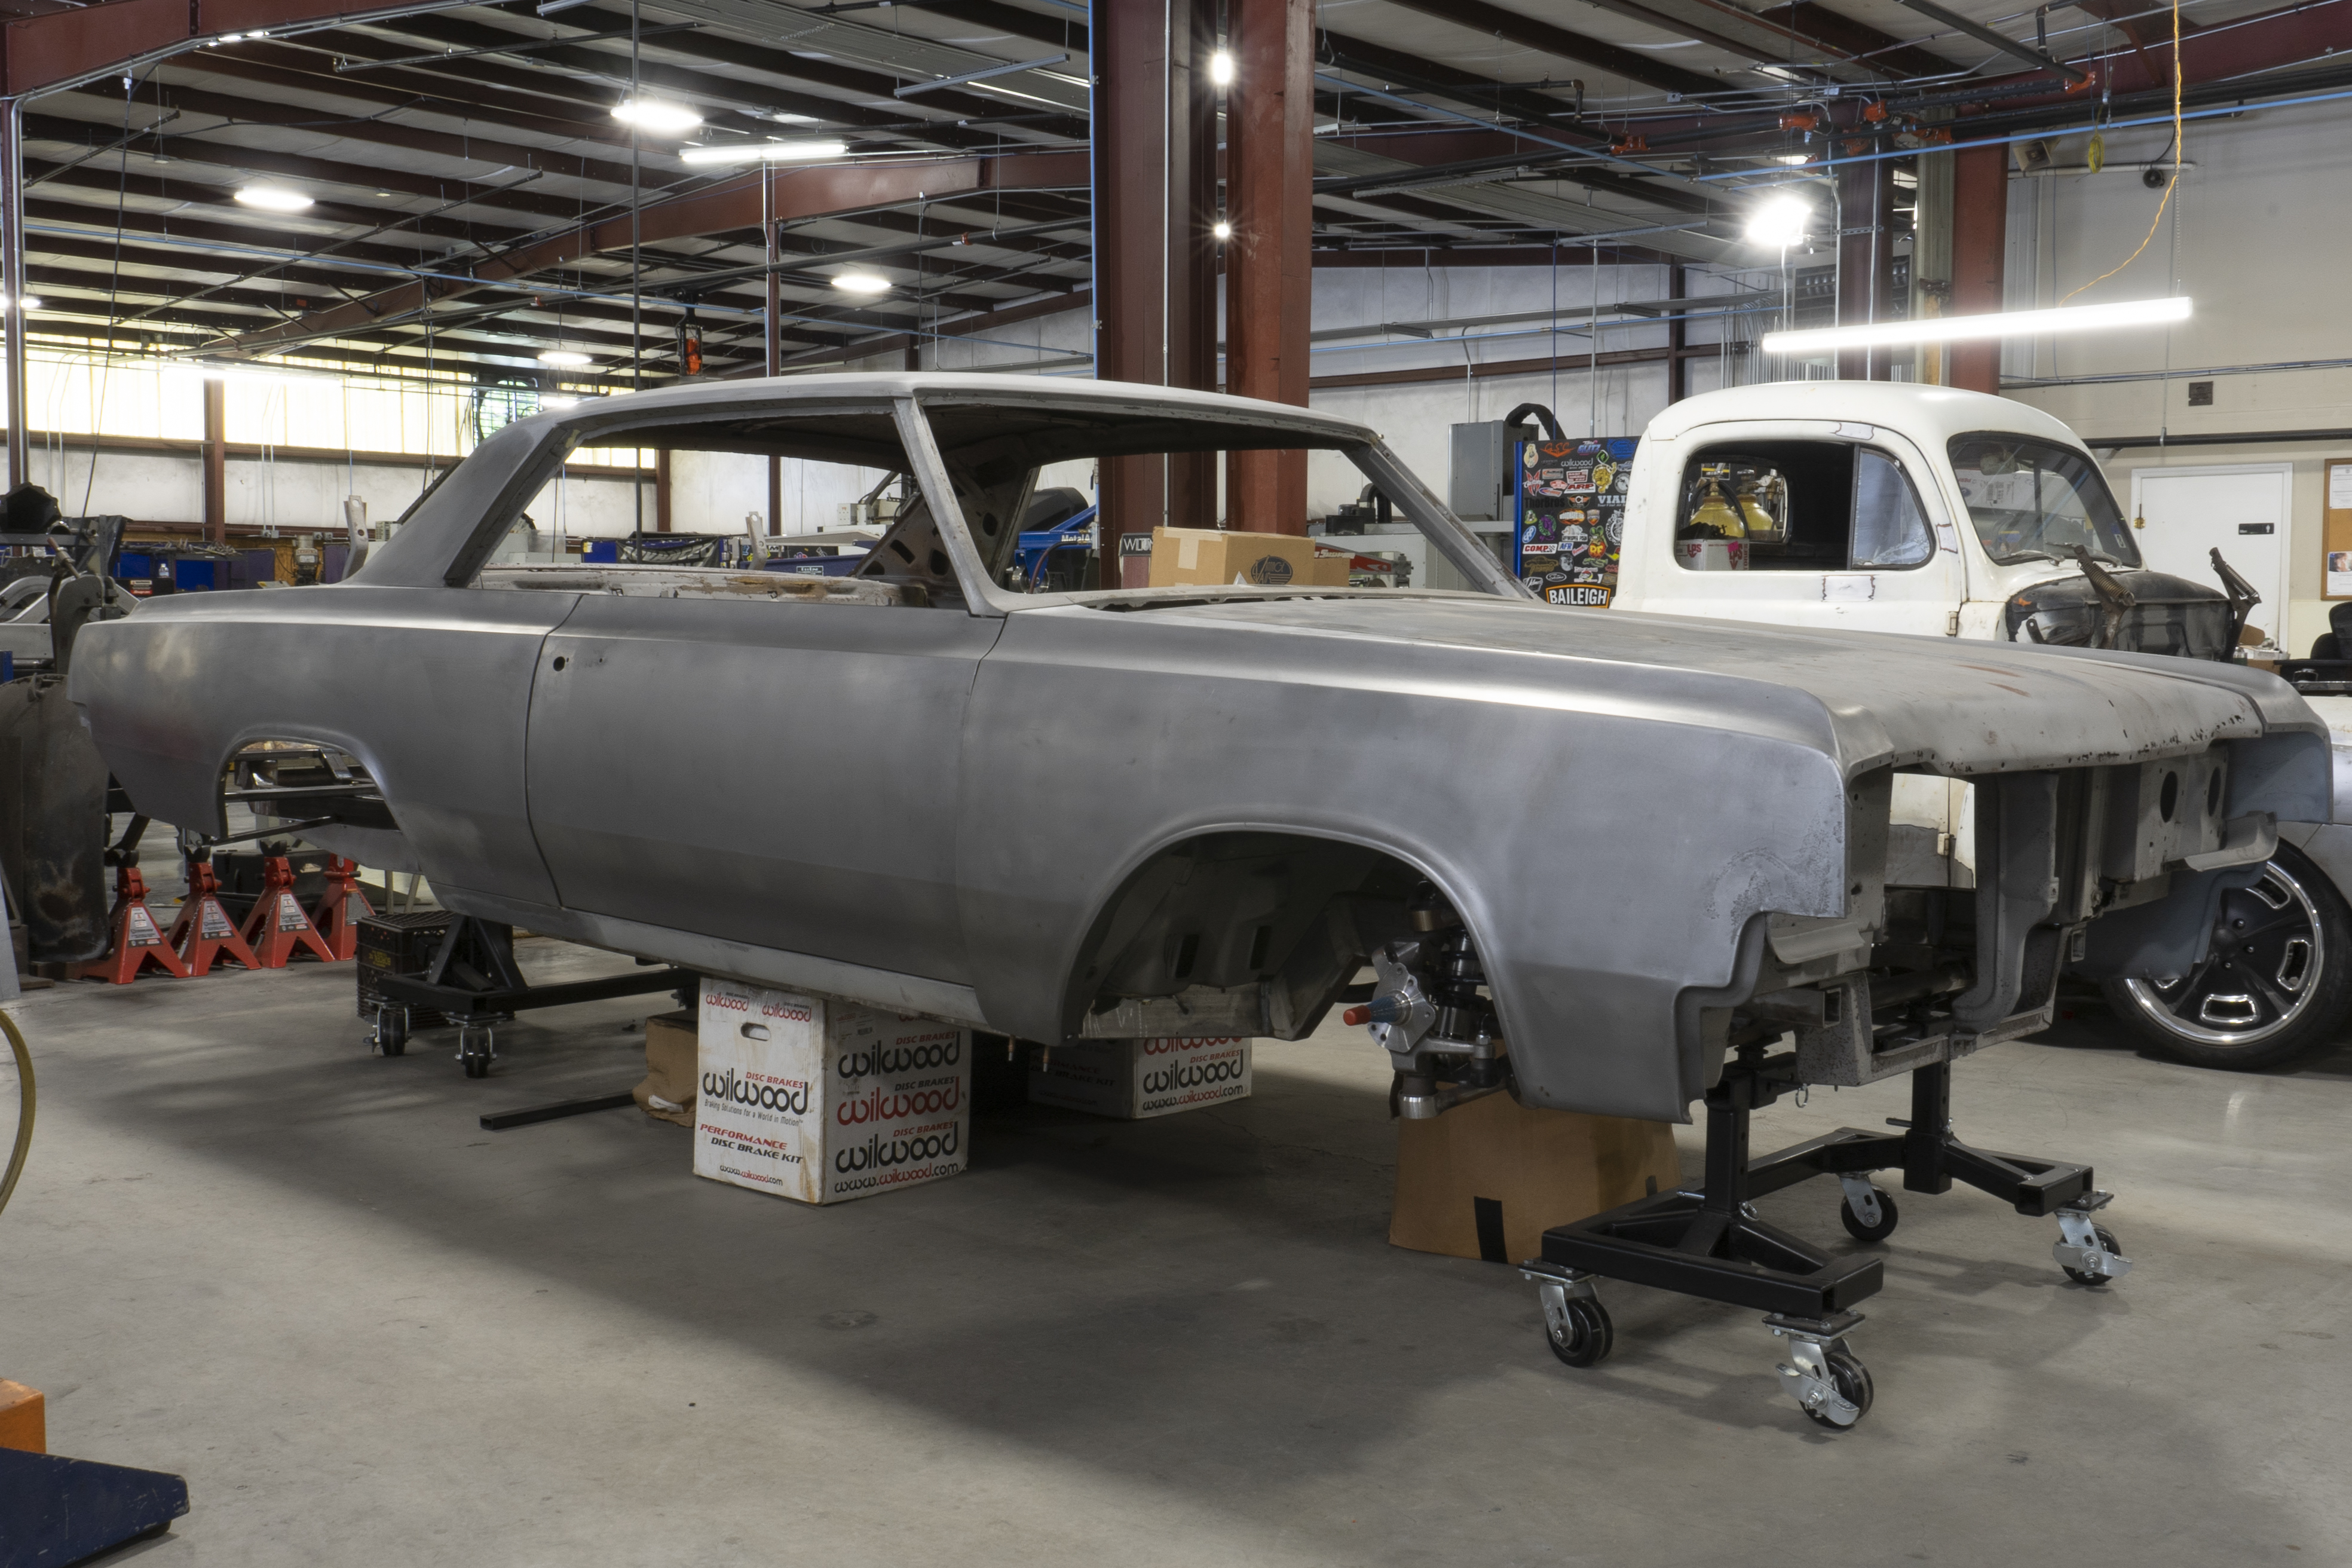 scotts-hotrods-65-cutlass-project-112